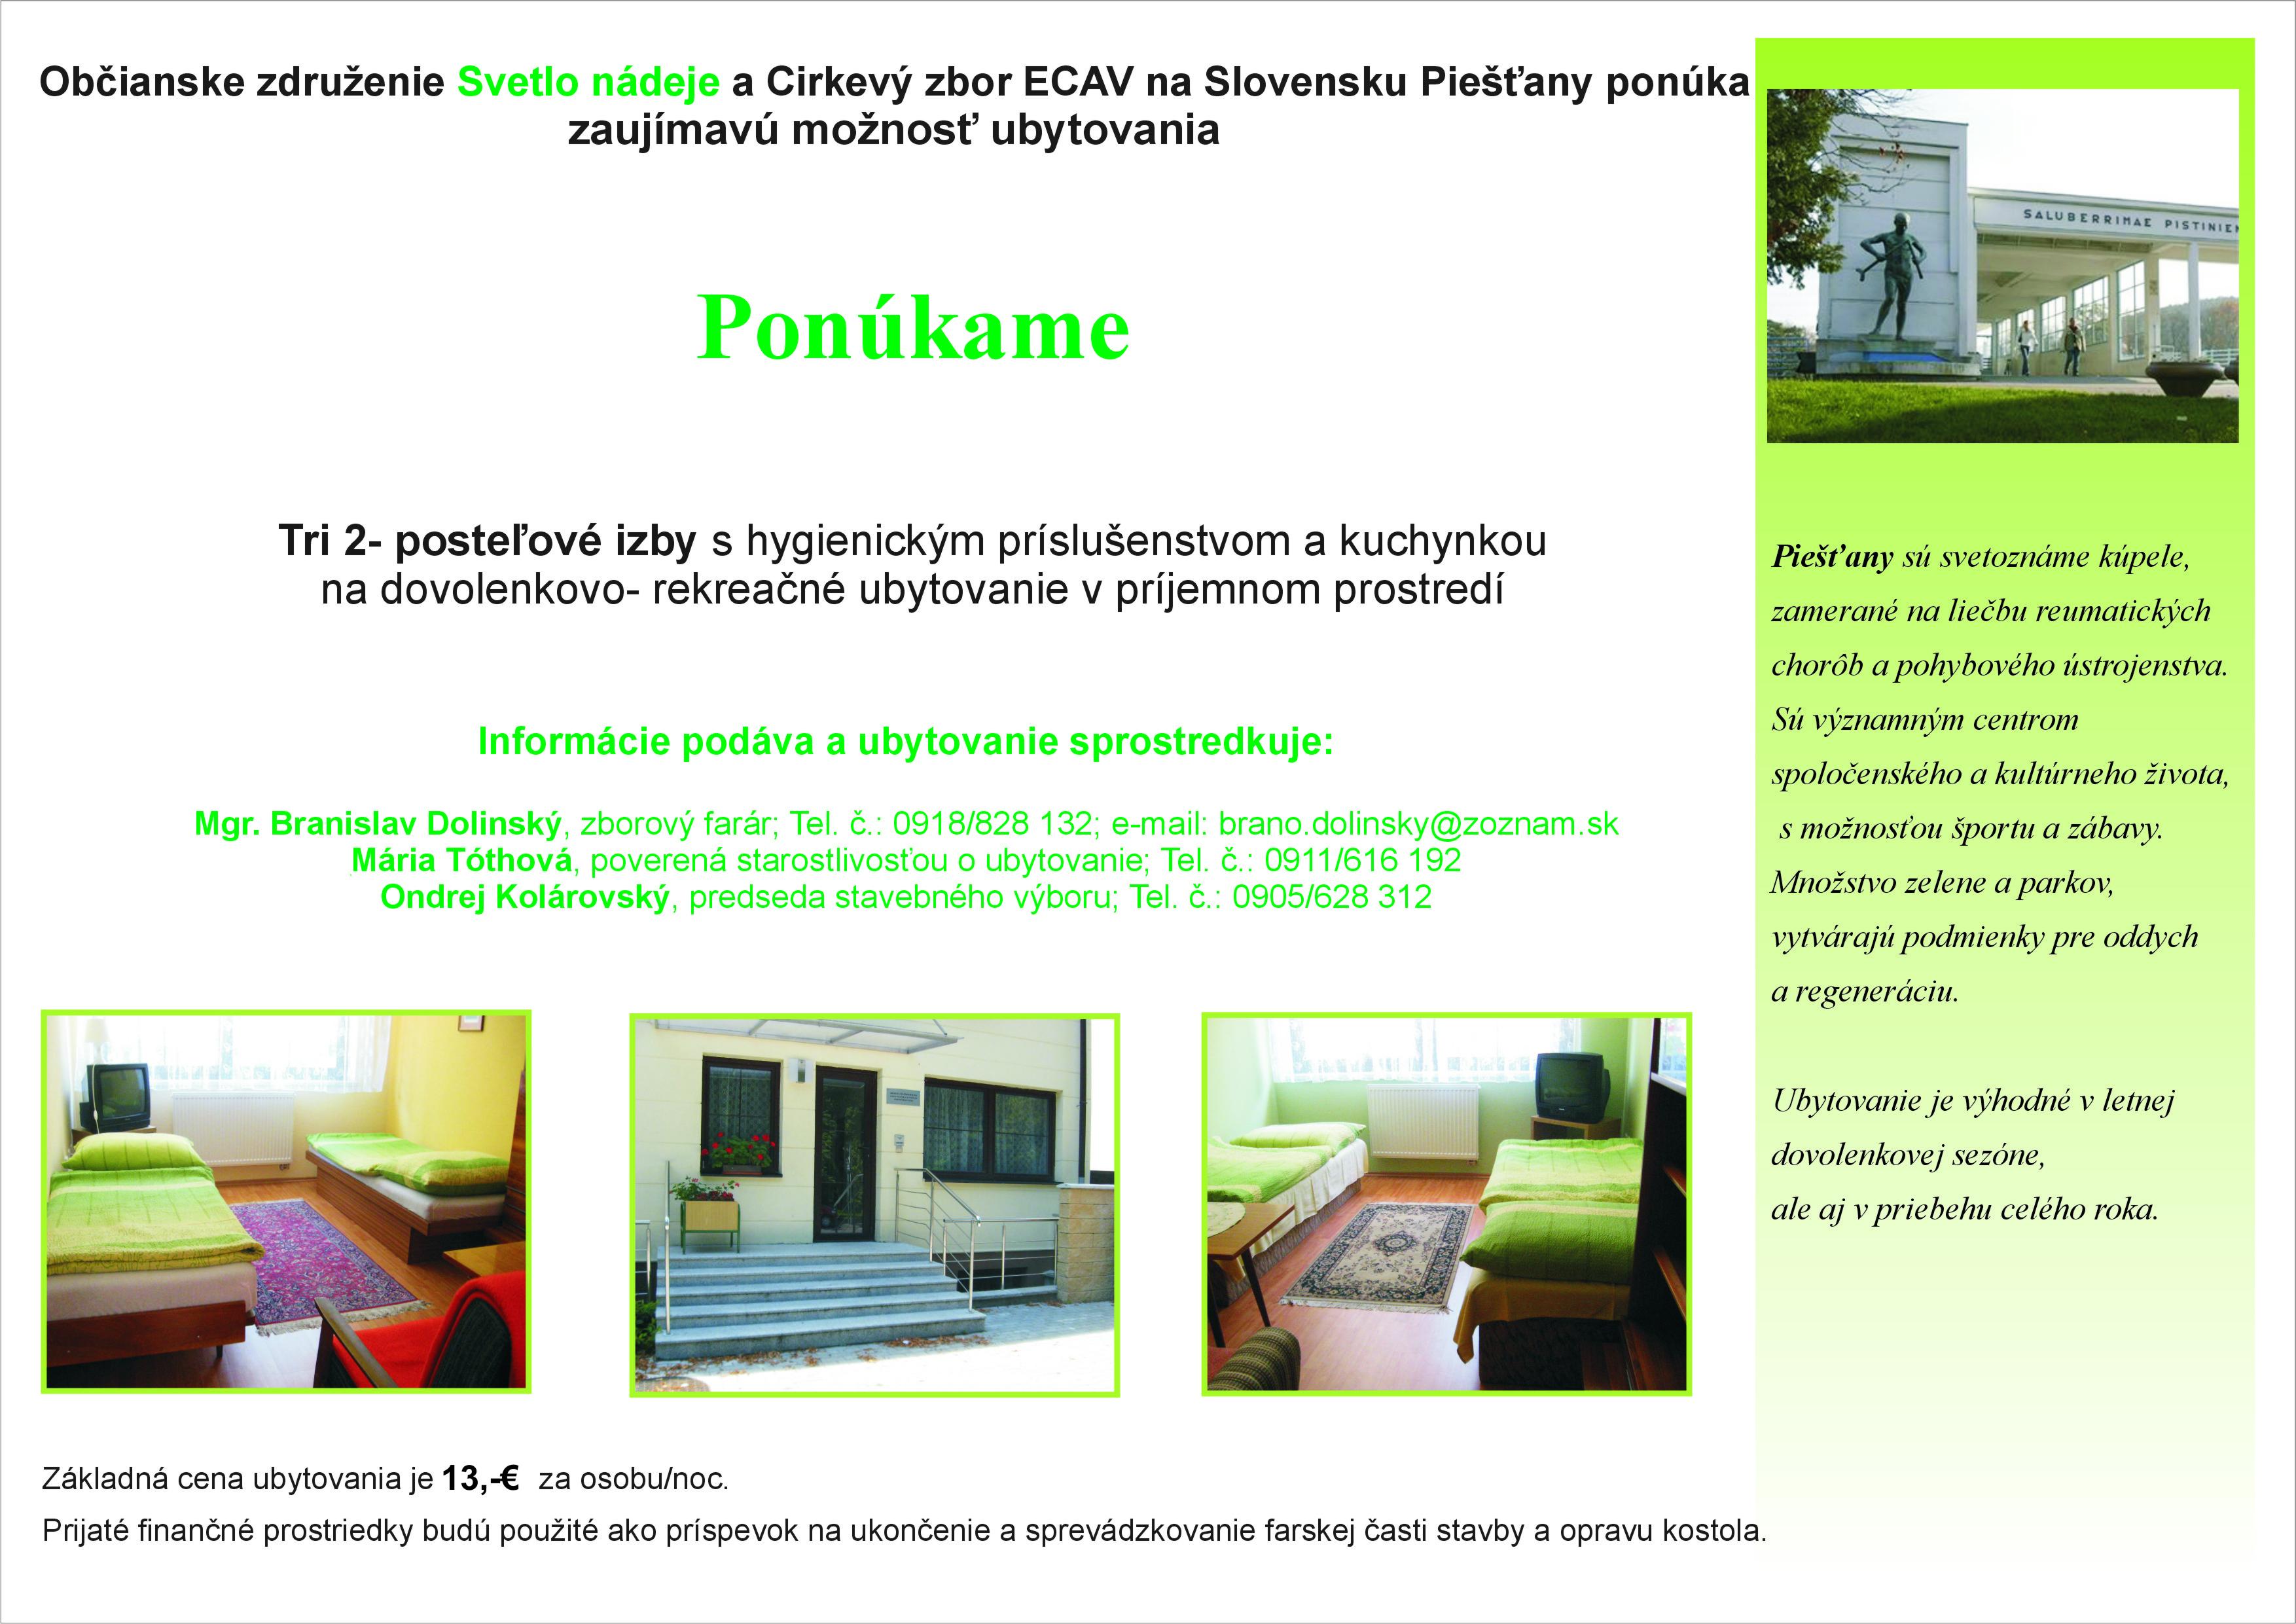 Piešťany - ubytovanie / ubytování - cena 13 EUR za osobu a noc - CENTRUM MESTA !!!